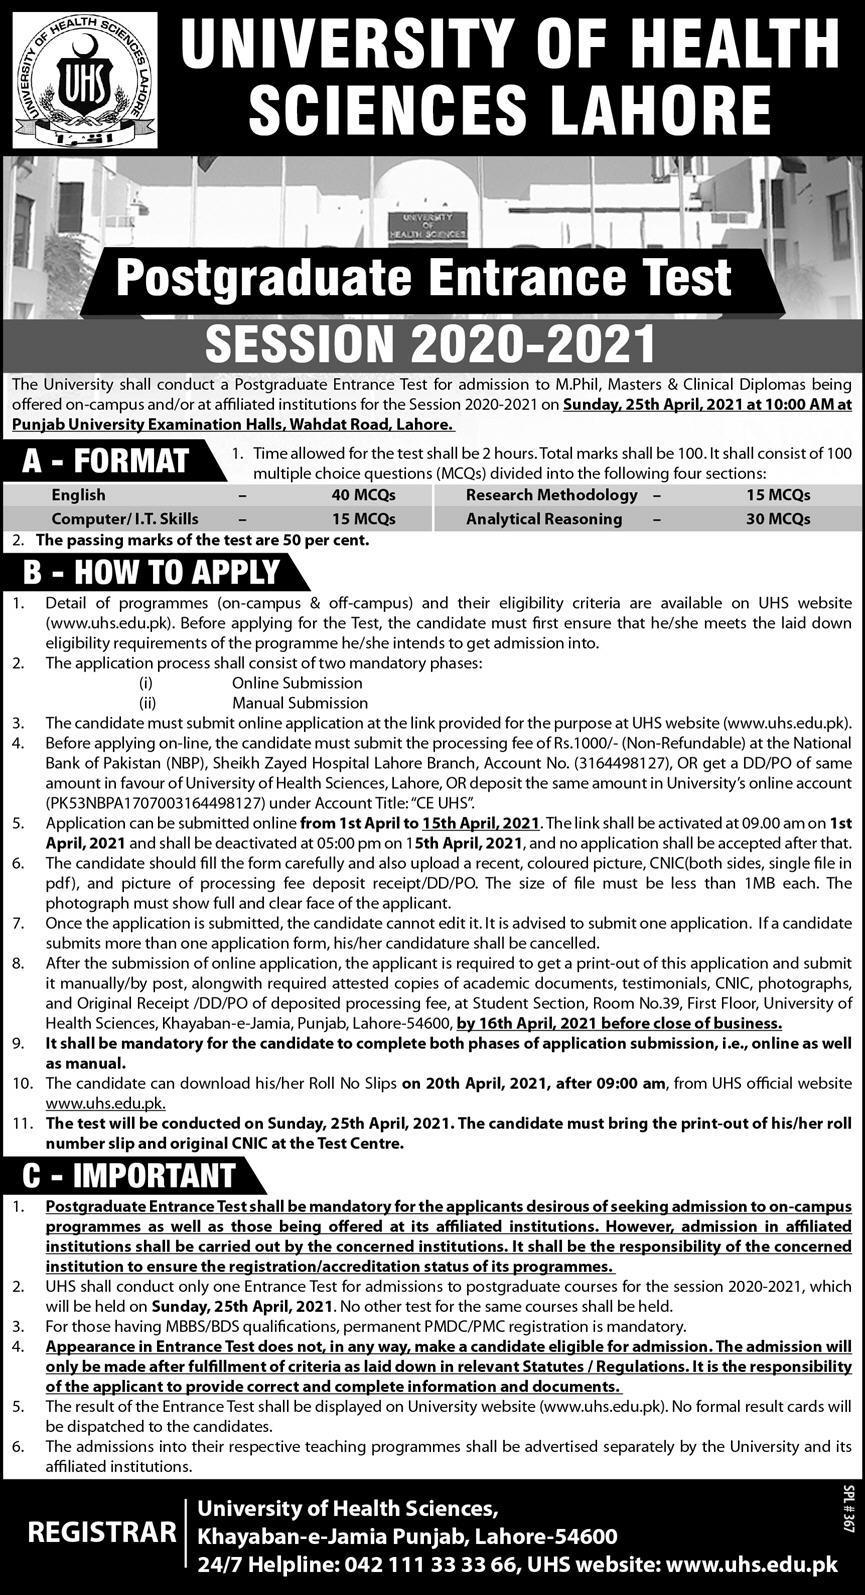 University of Health Sciences LahorePostgraduate Entry Test 2021